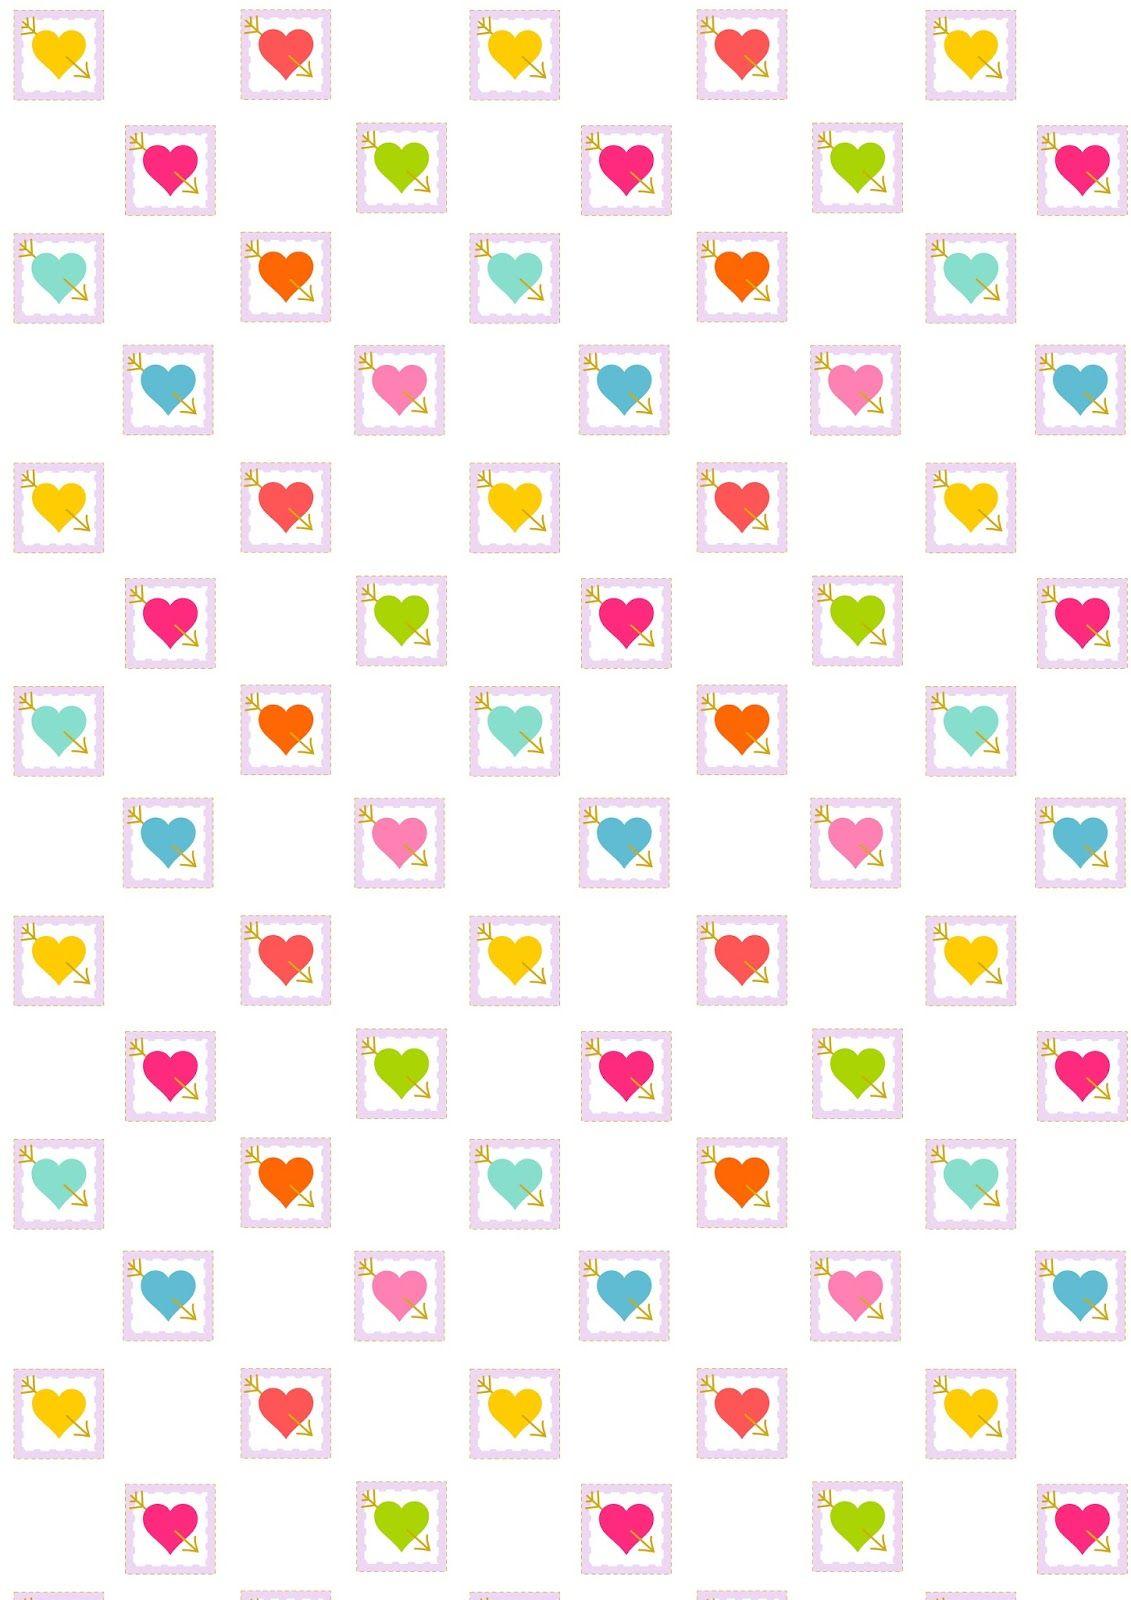 Free Digital Heart Scrapbooking Paper Ausdruckbares Geschenkpapier Freebie Free Printable Planner Stickers Scrapbook Paper Printable Crafts